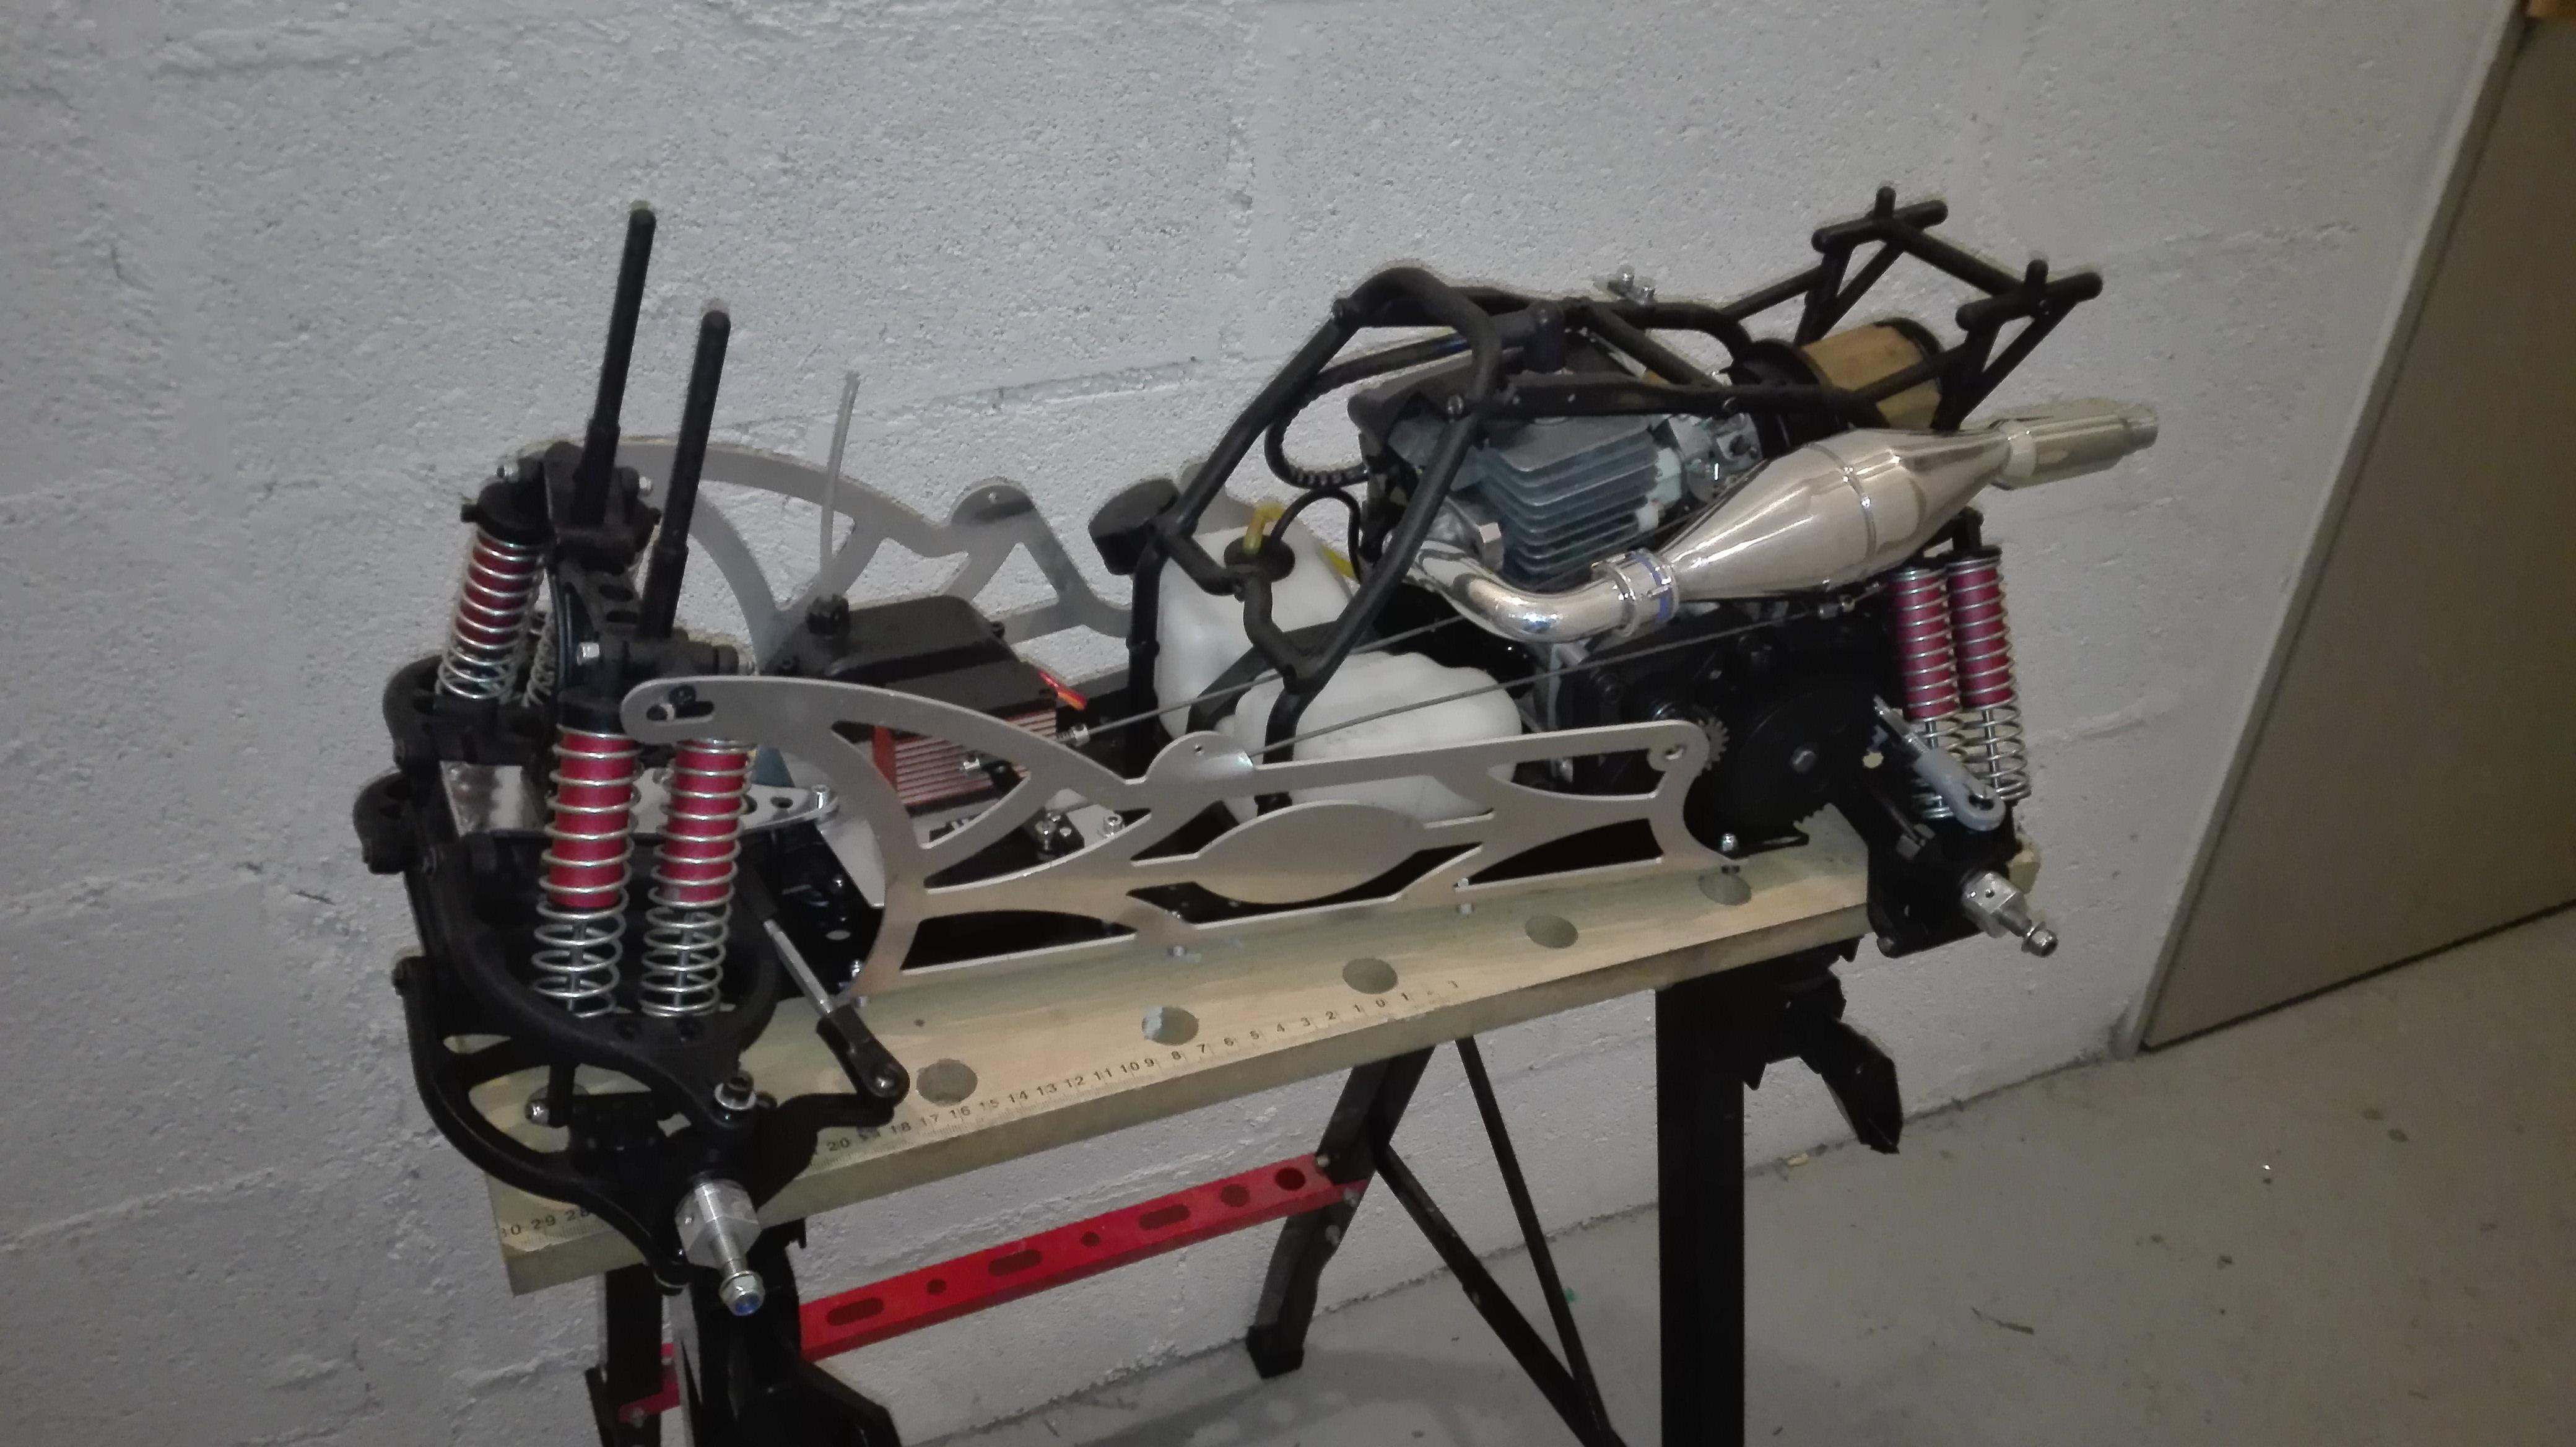 re-montage complet monster truck FG depuis un chassis nu - Page 2 180303061541591881